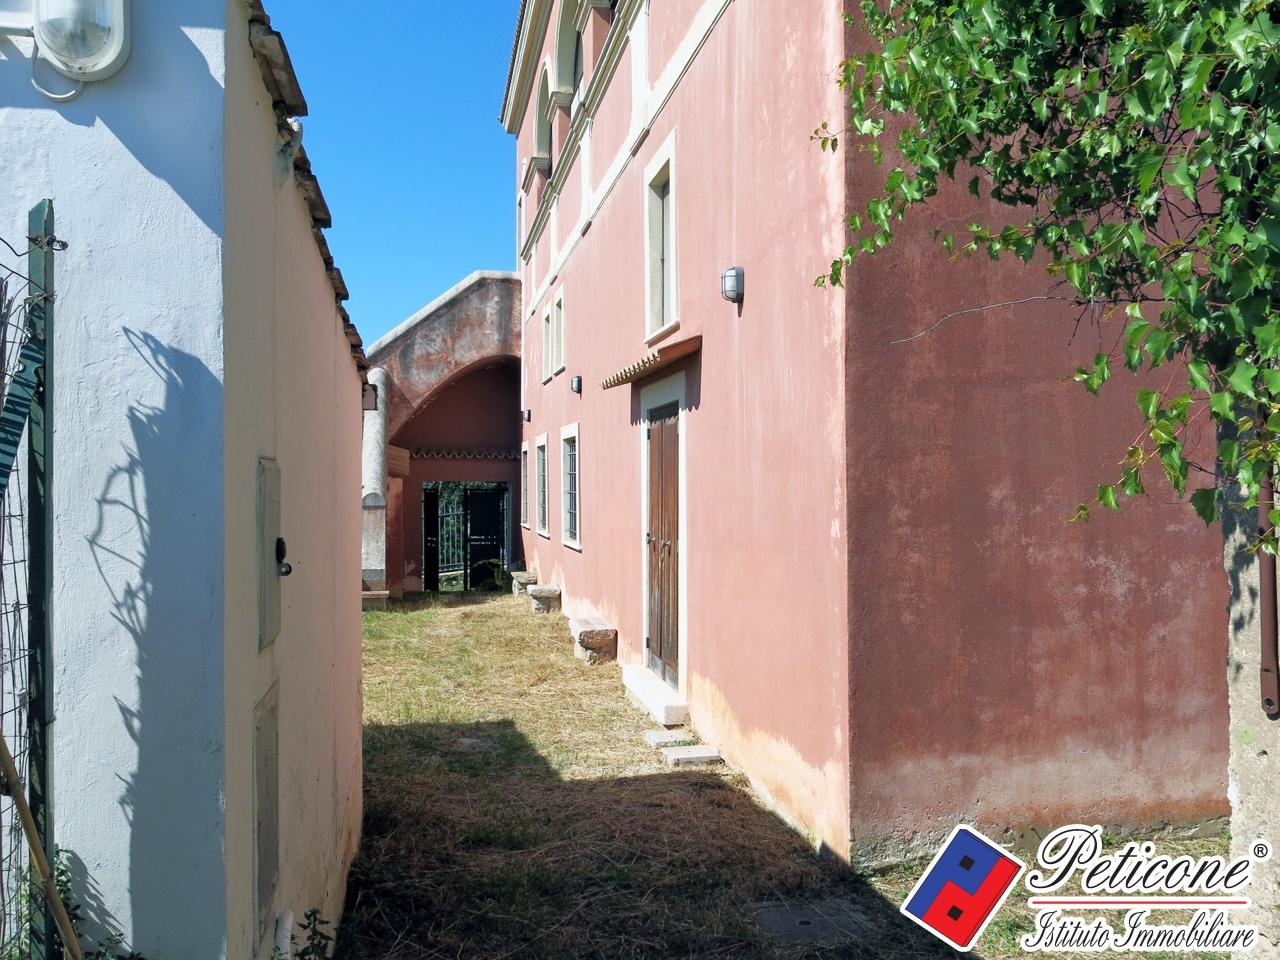 Villa in Vendita a Gaeta: 5 locali, 250 mq - Foto 22